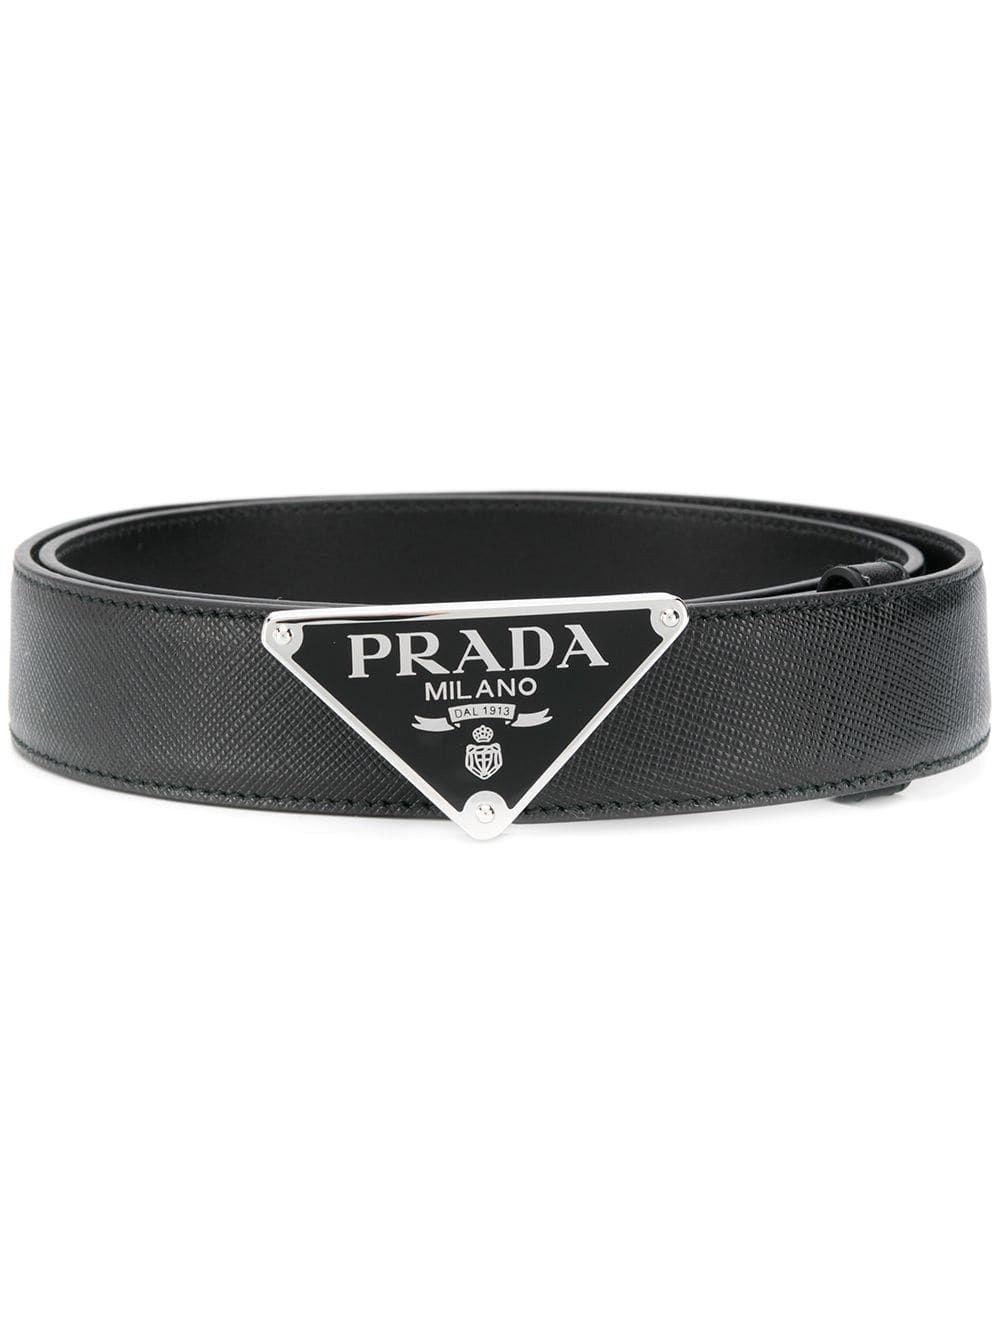 PRADA belts logo buckle belt Belt buckles, Prada, Belt